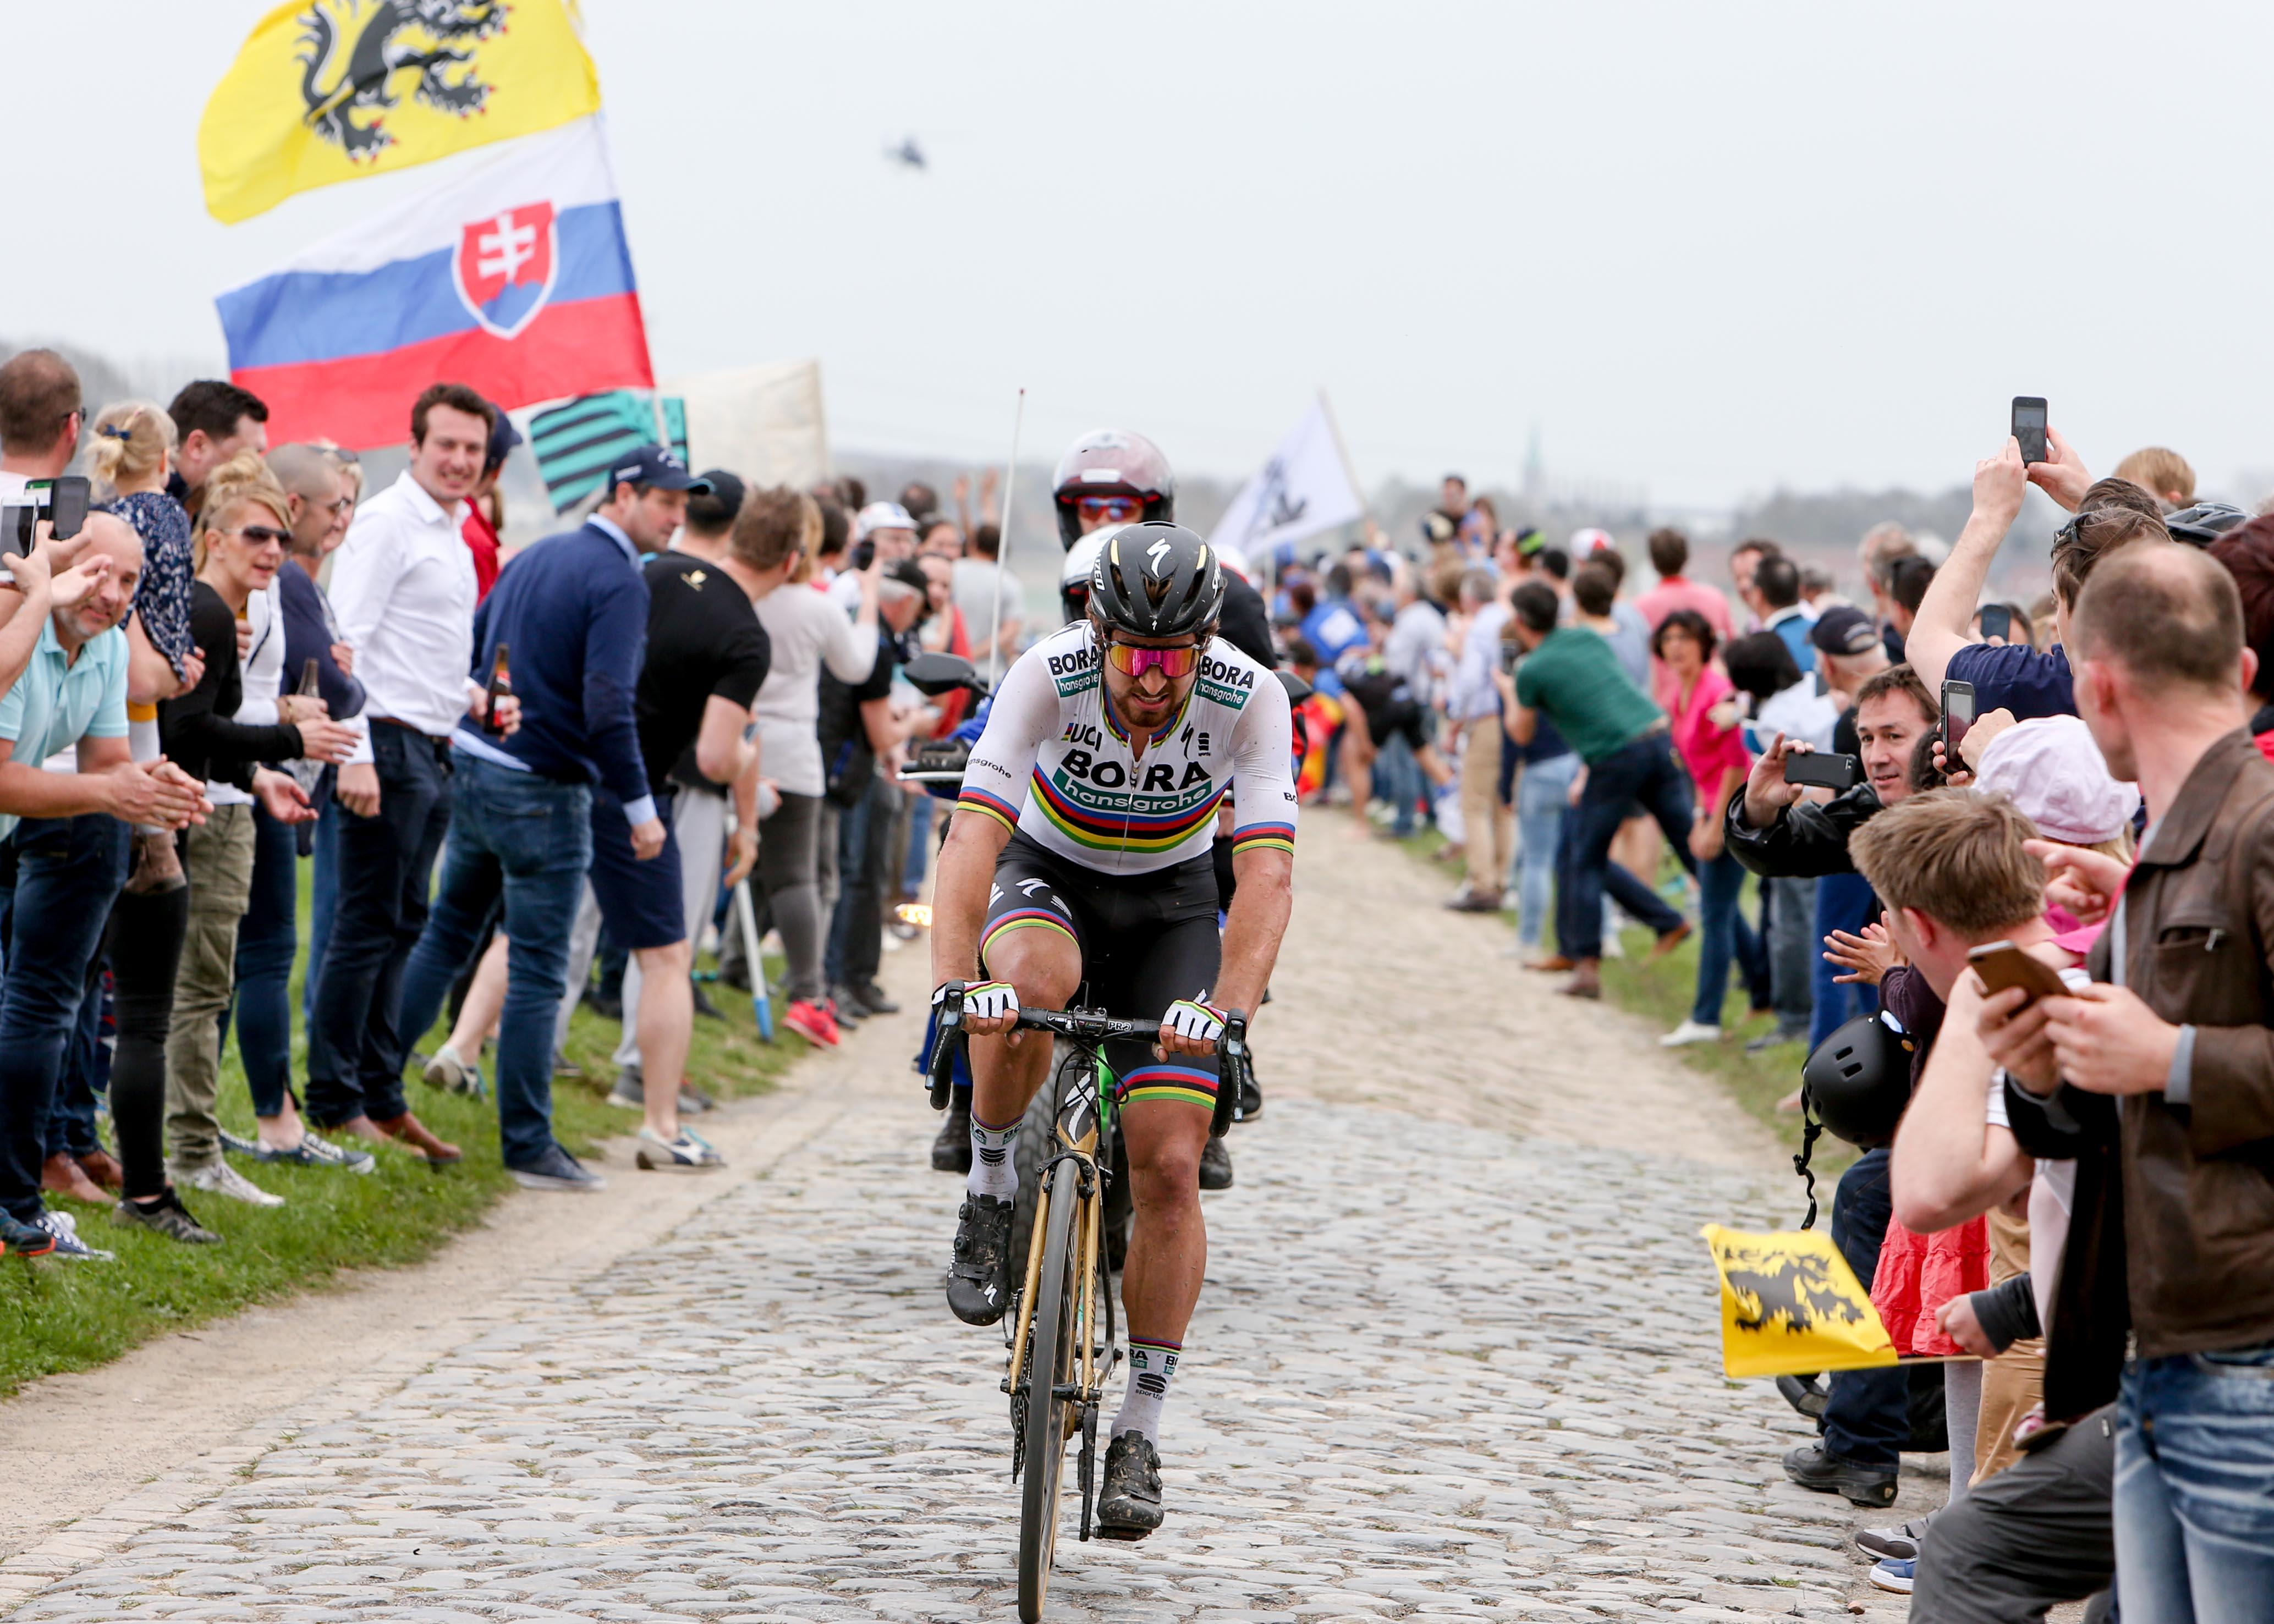 2018 Paris Roubaix 116th Edition - World Champion Peter Sagan (B